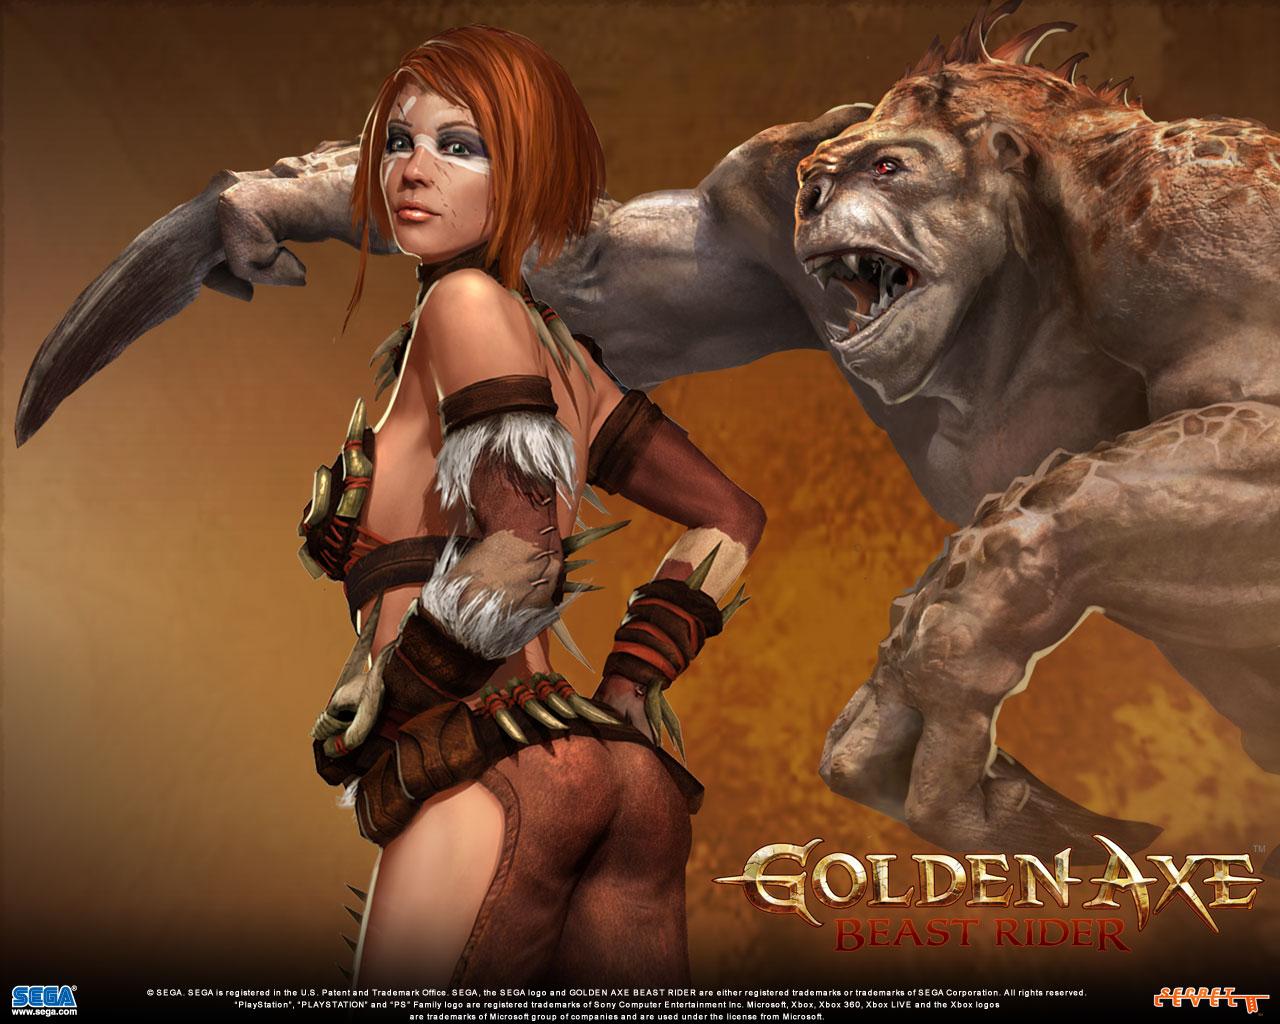 http://2.bp.blogspot.com/-zZqOD3VKPA8/T0u3zTFa8iI/AAAAAAAAAuU/N4jEpUnIkMQ/s1600/Golden_Axe_Beast_Rider_HD_Wallpaper-gWb.jpg